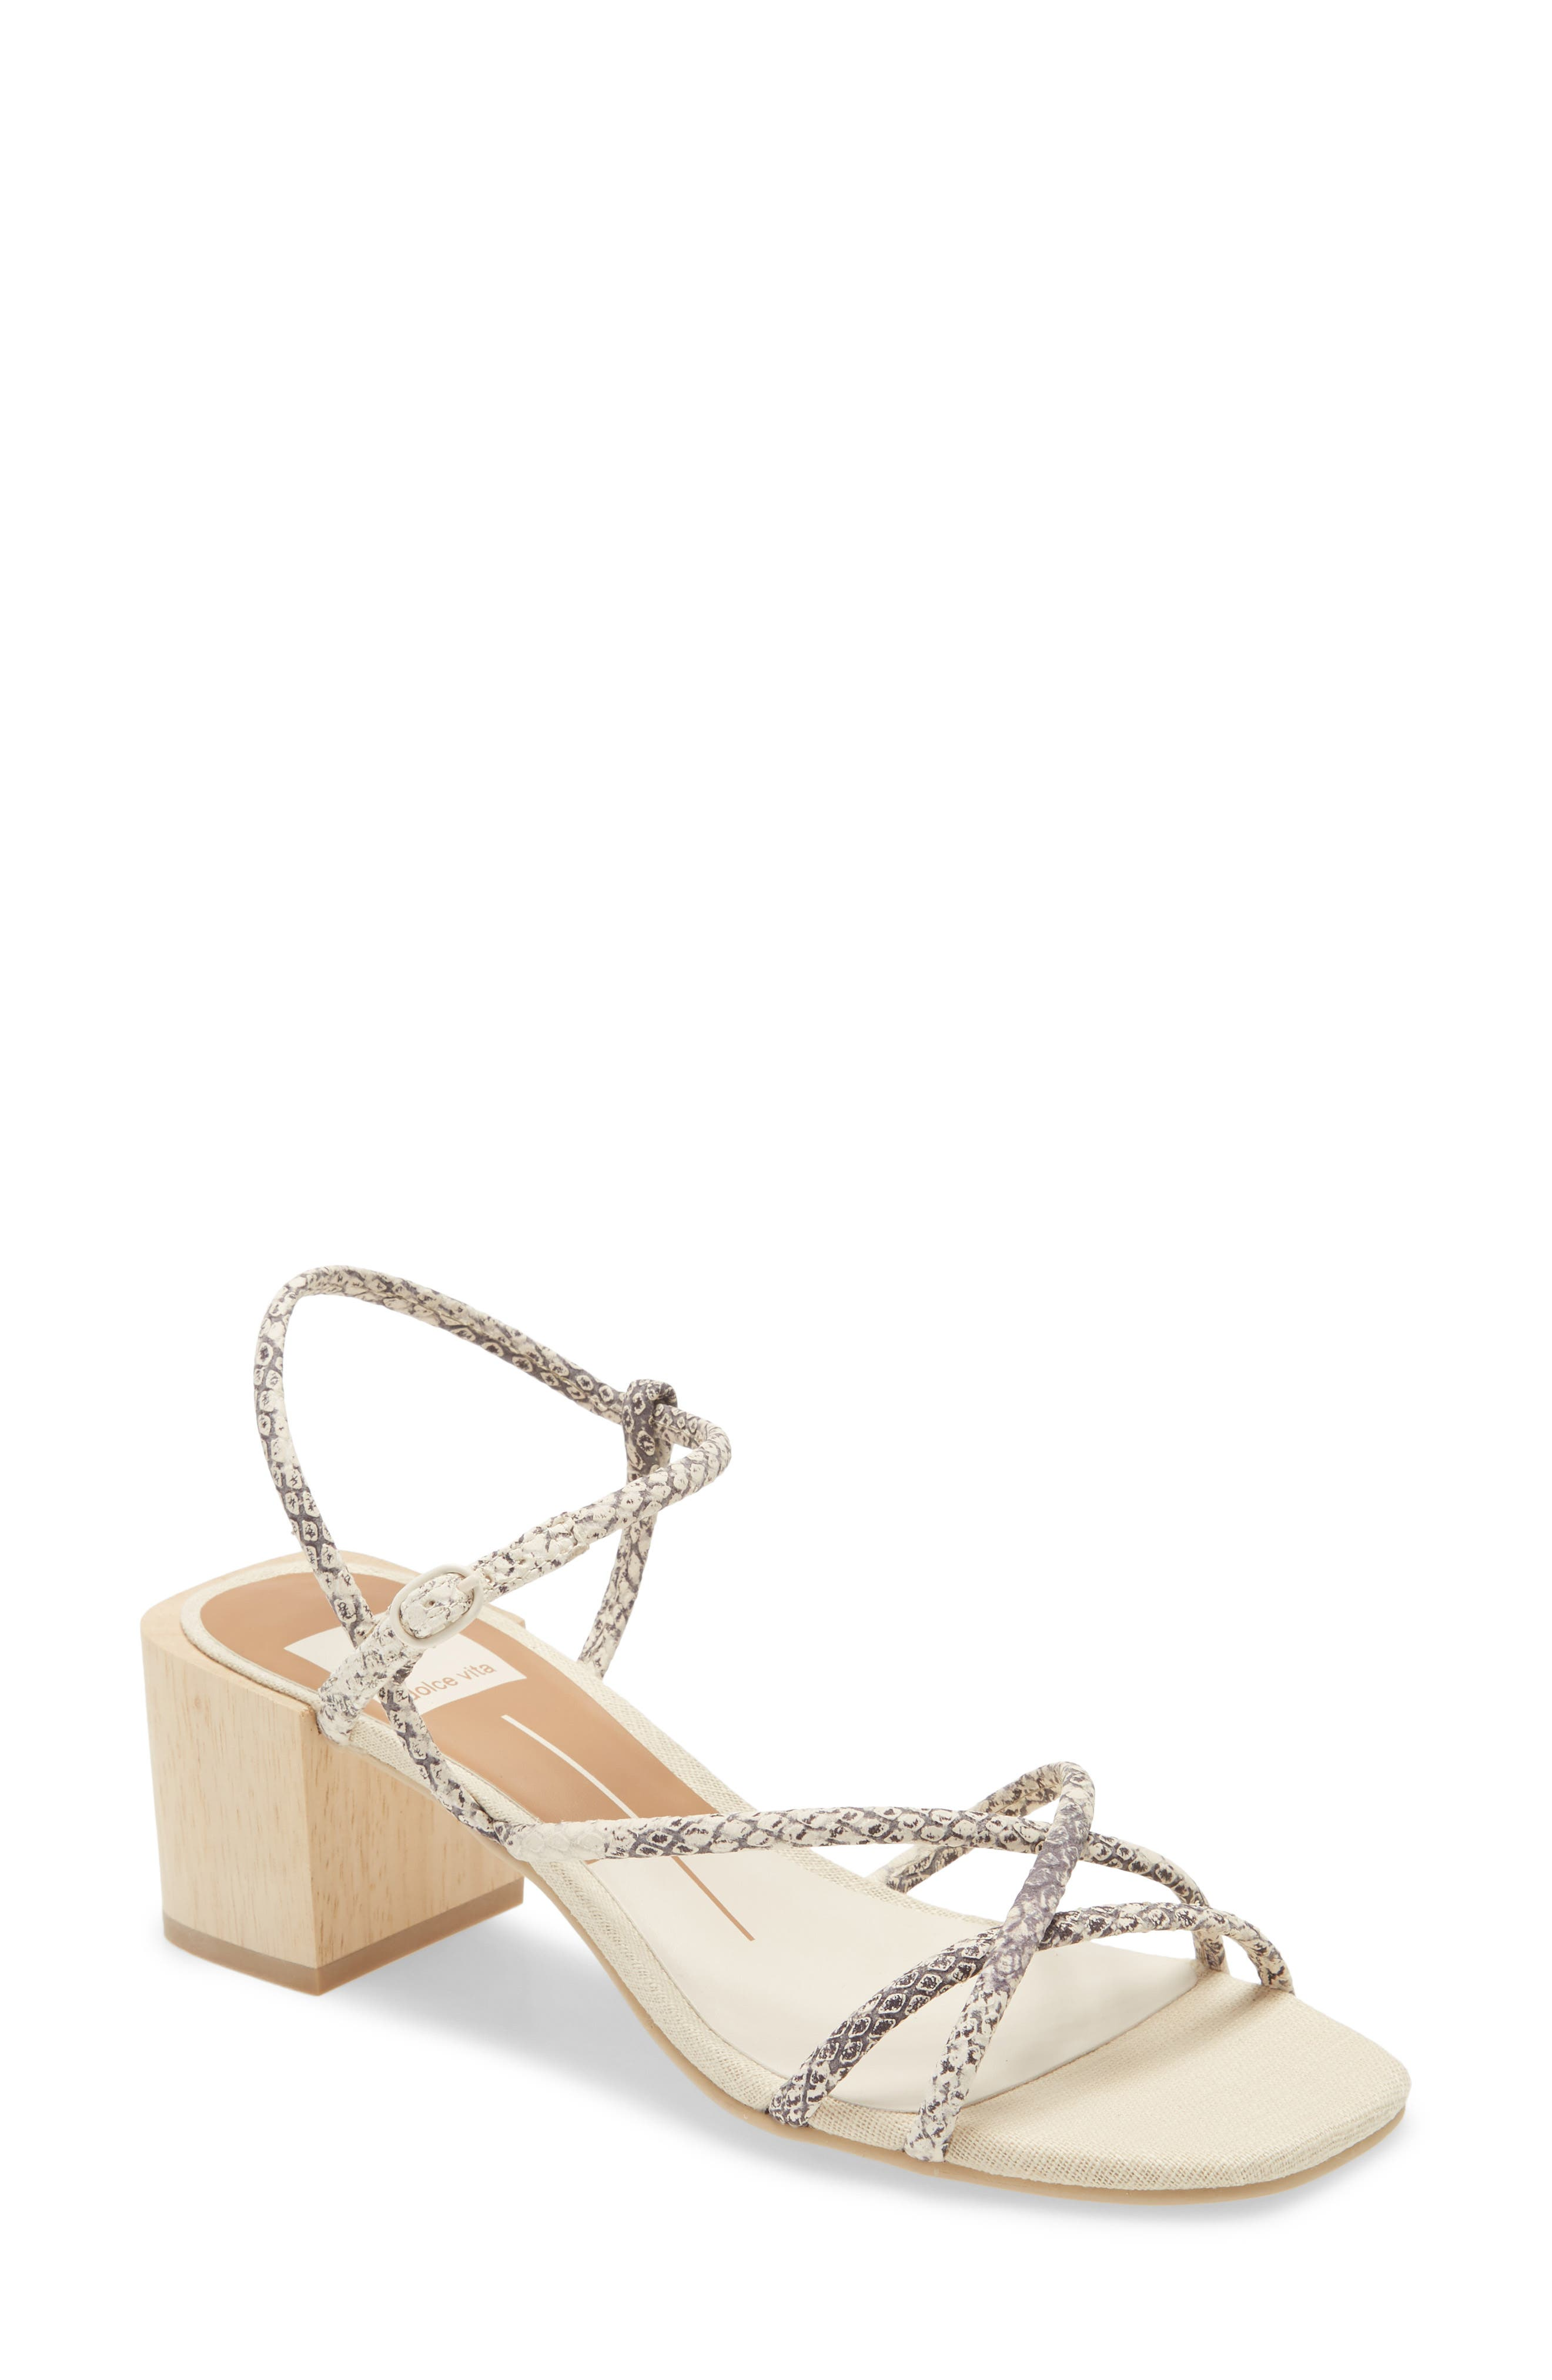 LADIES T BAR Sling Back Buckle Block Heel Sandals Floral Navy Size 3 4 5 6 7 8